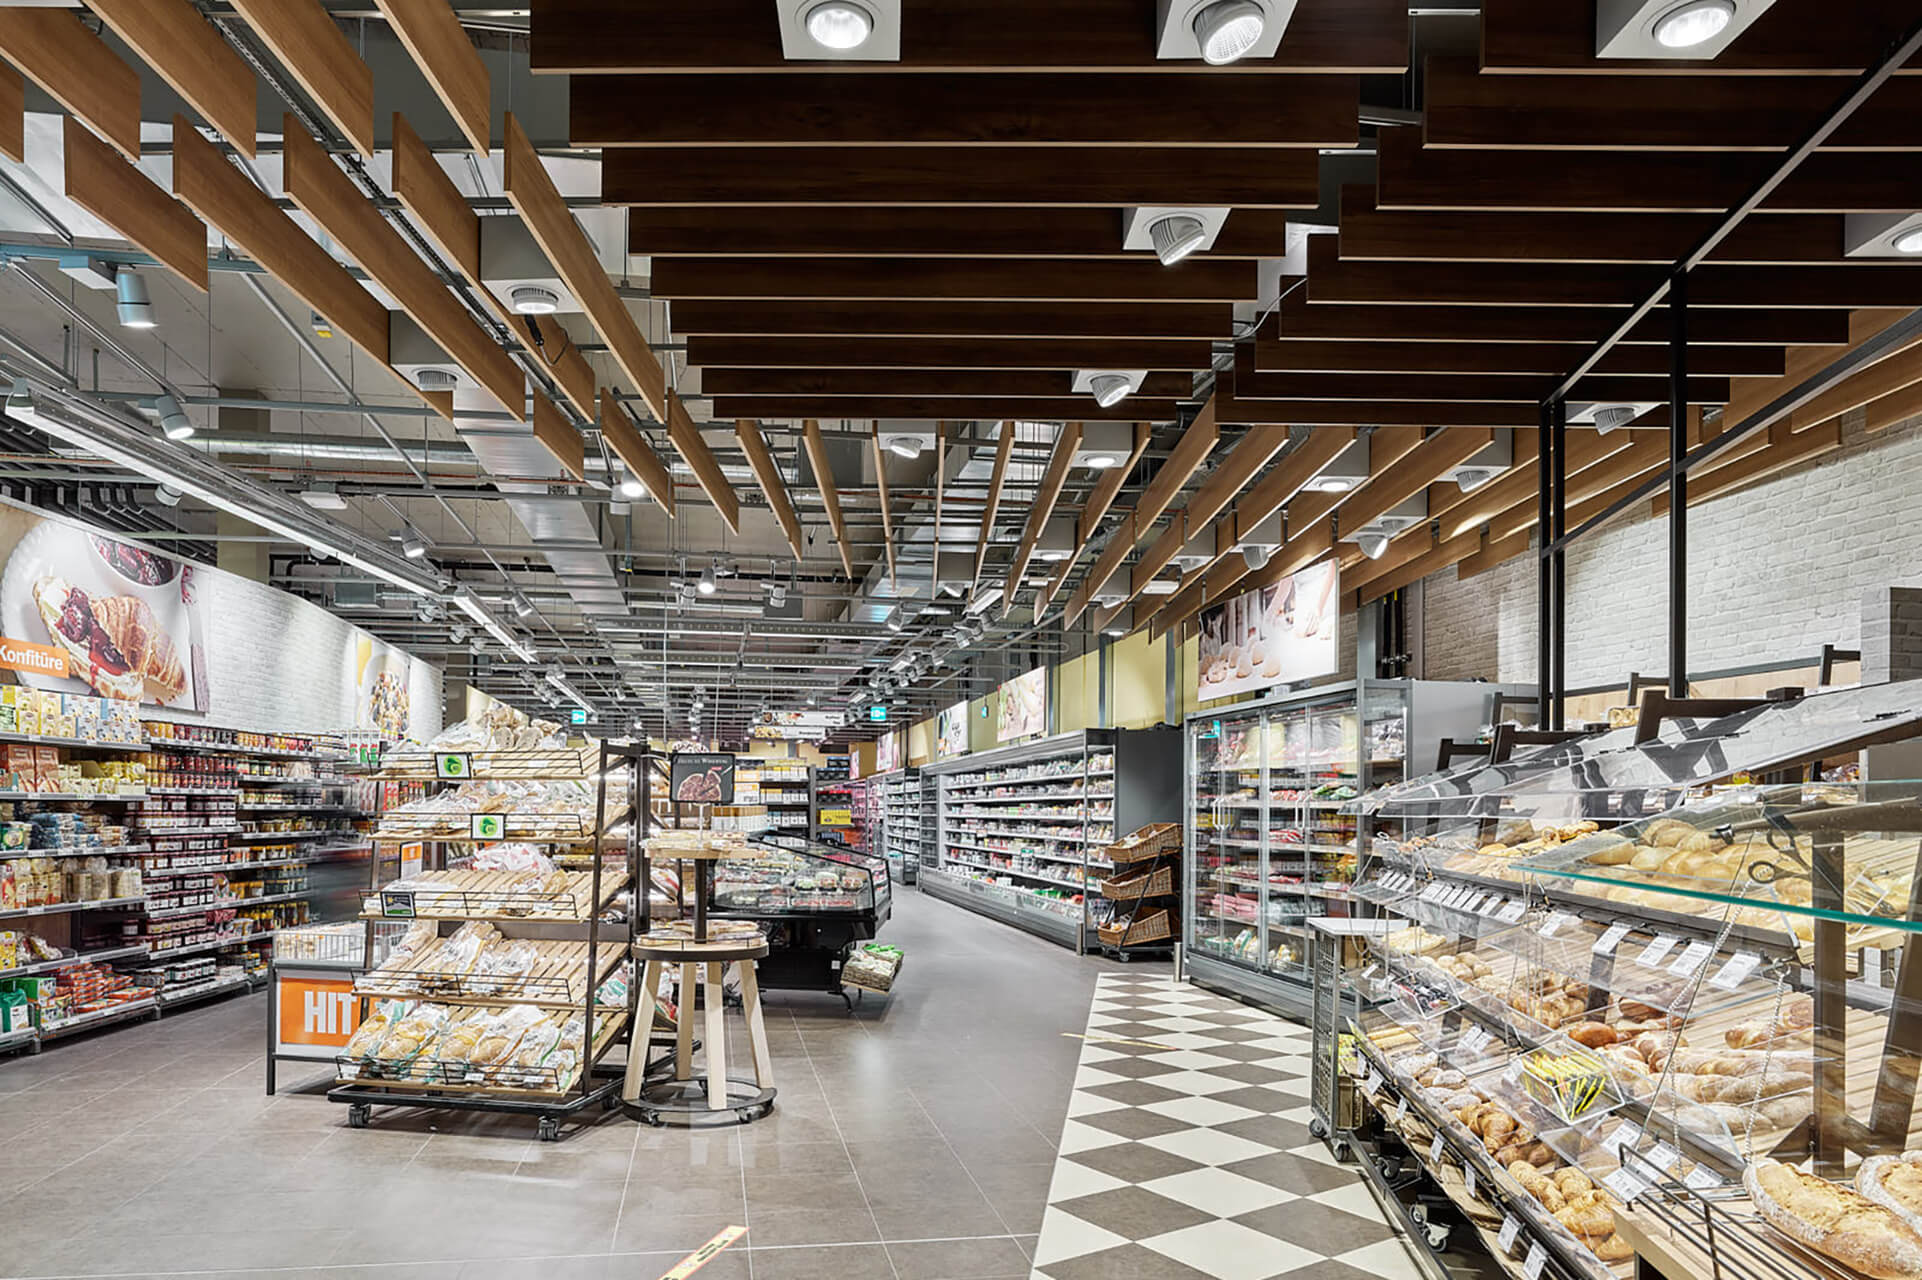 https://fsw-kreatektur.ch/wp-content/uploads/Fsw-Kreatektur-Architektur-Bauleitung-Migros-Shopping-Brot-tiny.jpg